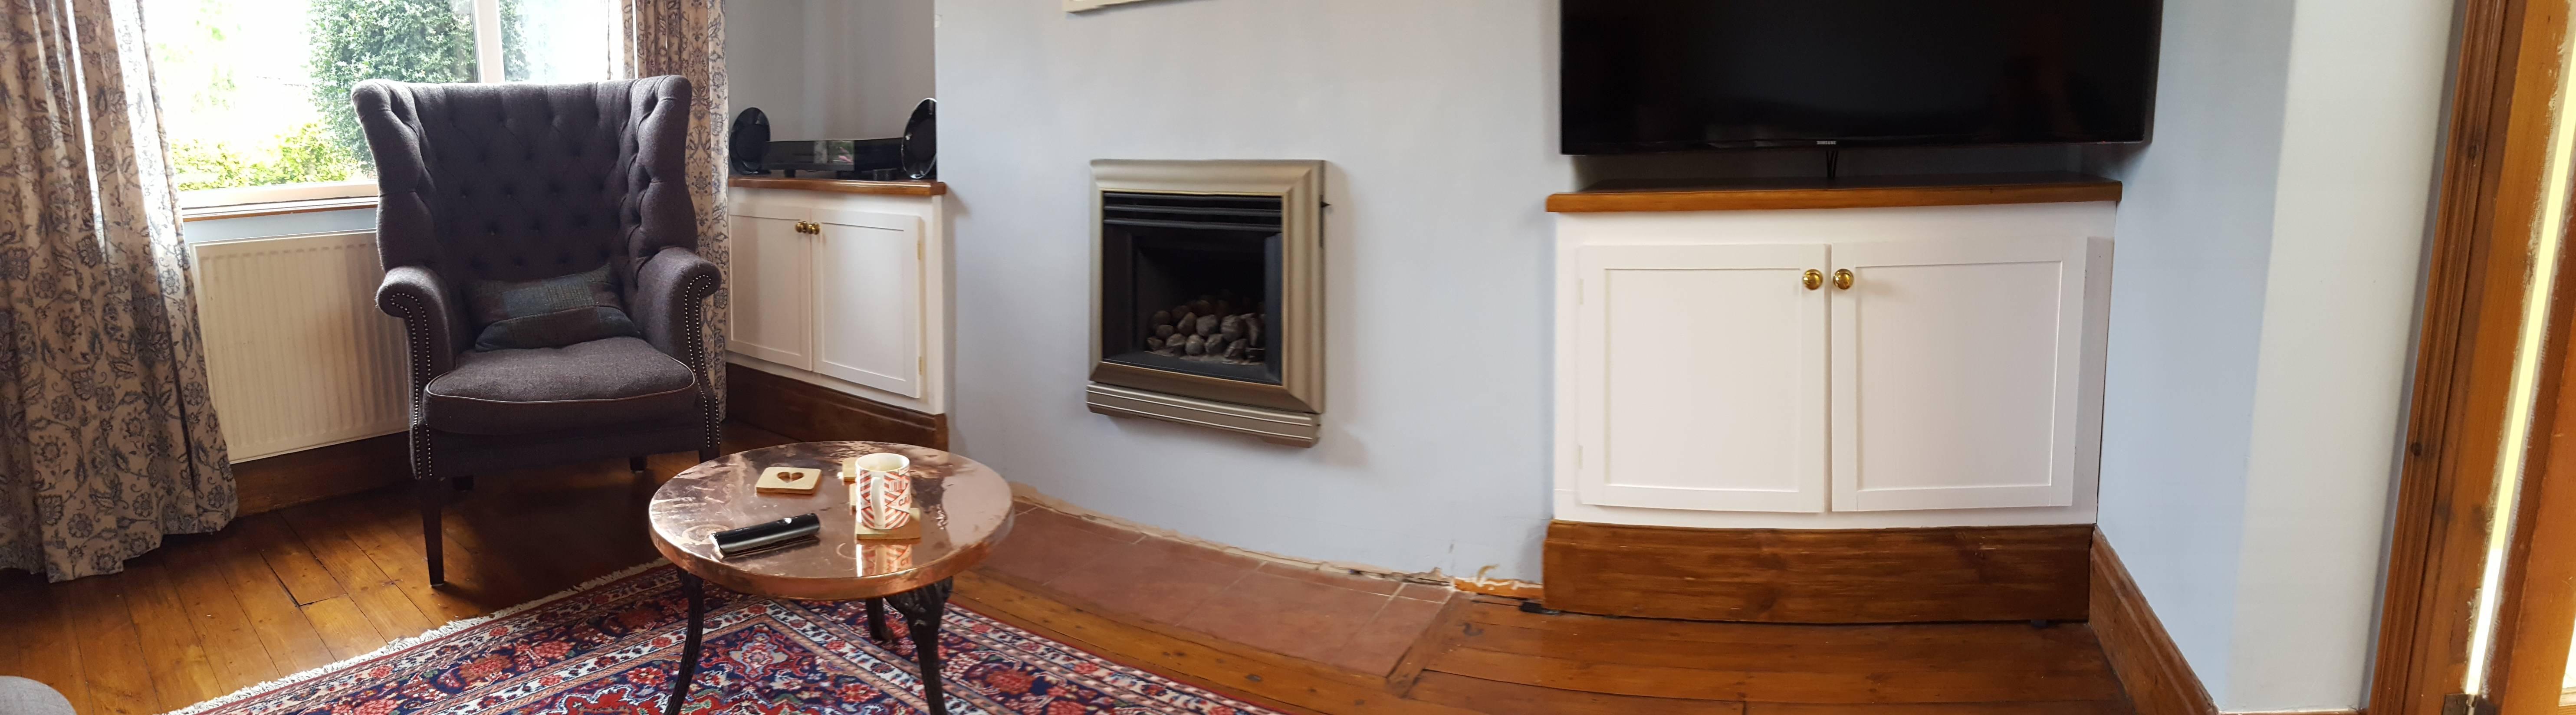 13 Stylish Turman Hardwood Flooring Warm Walnut 2021 free download turman hardwood flooring warm walnut of my first heading for v0e9ziy